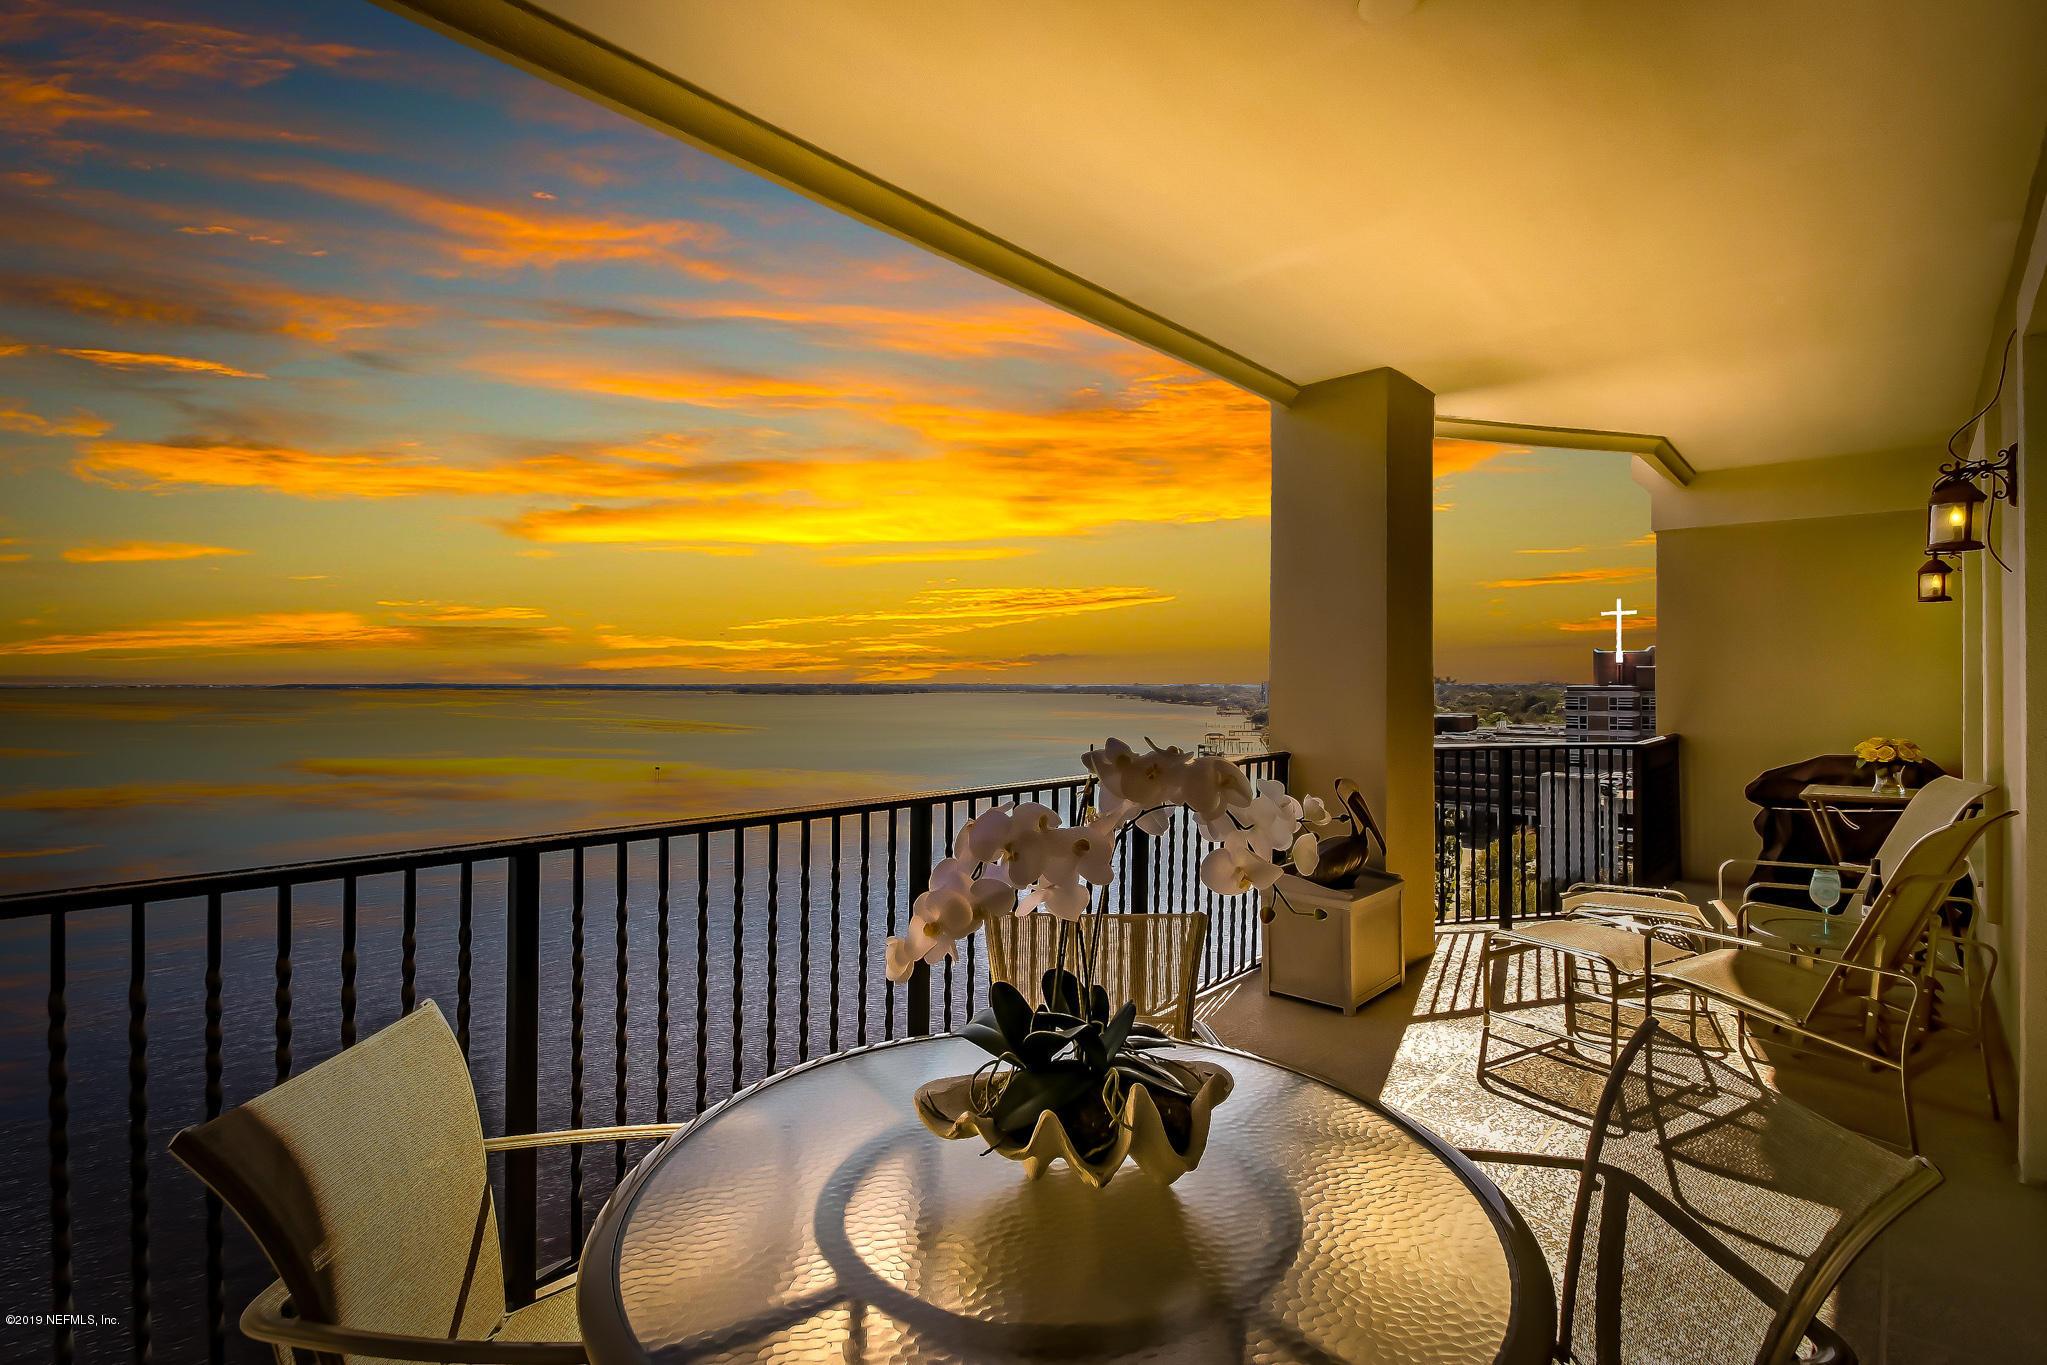 2358 RIVERSIDE, JACKSONVILLE, FLORIDA 32204, 3 Bedrooms Bedrooms, ,3 BathroomsBathrooms,Condo,For sale,RIVERSIDE,983794